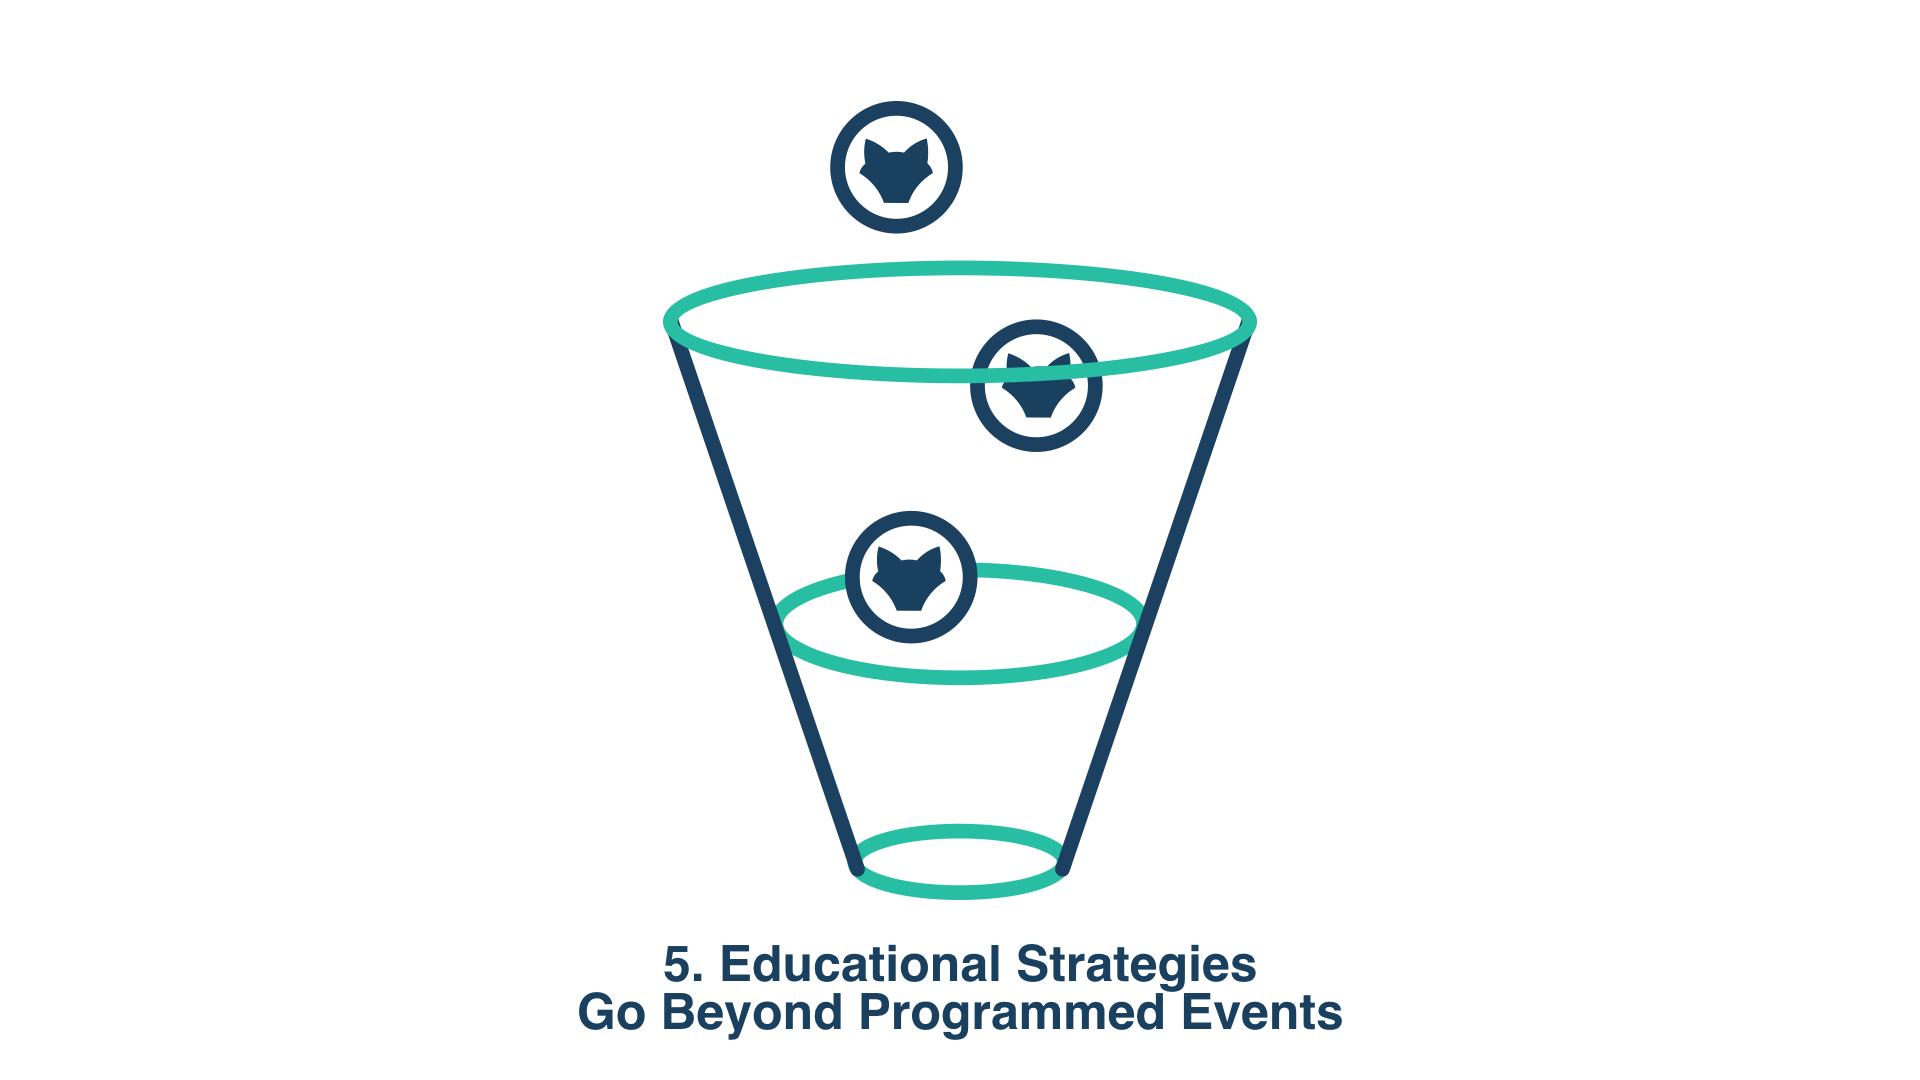 5. Educational Strategies Go Beyond Programmed Events